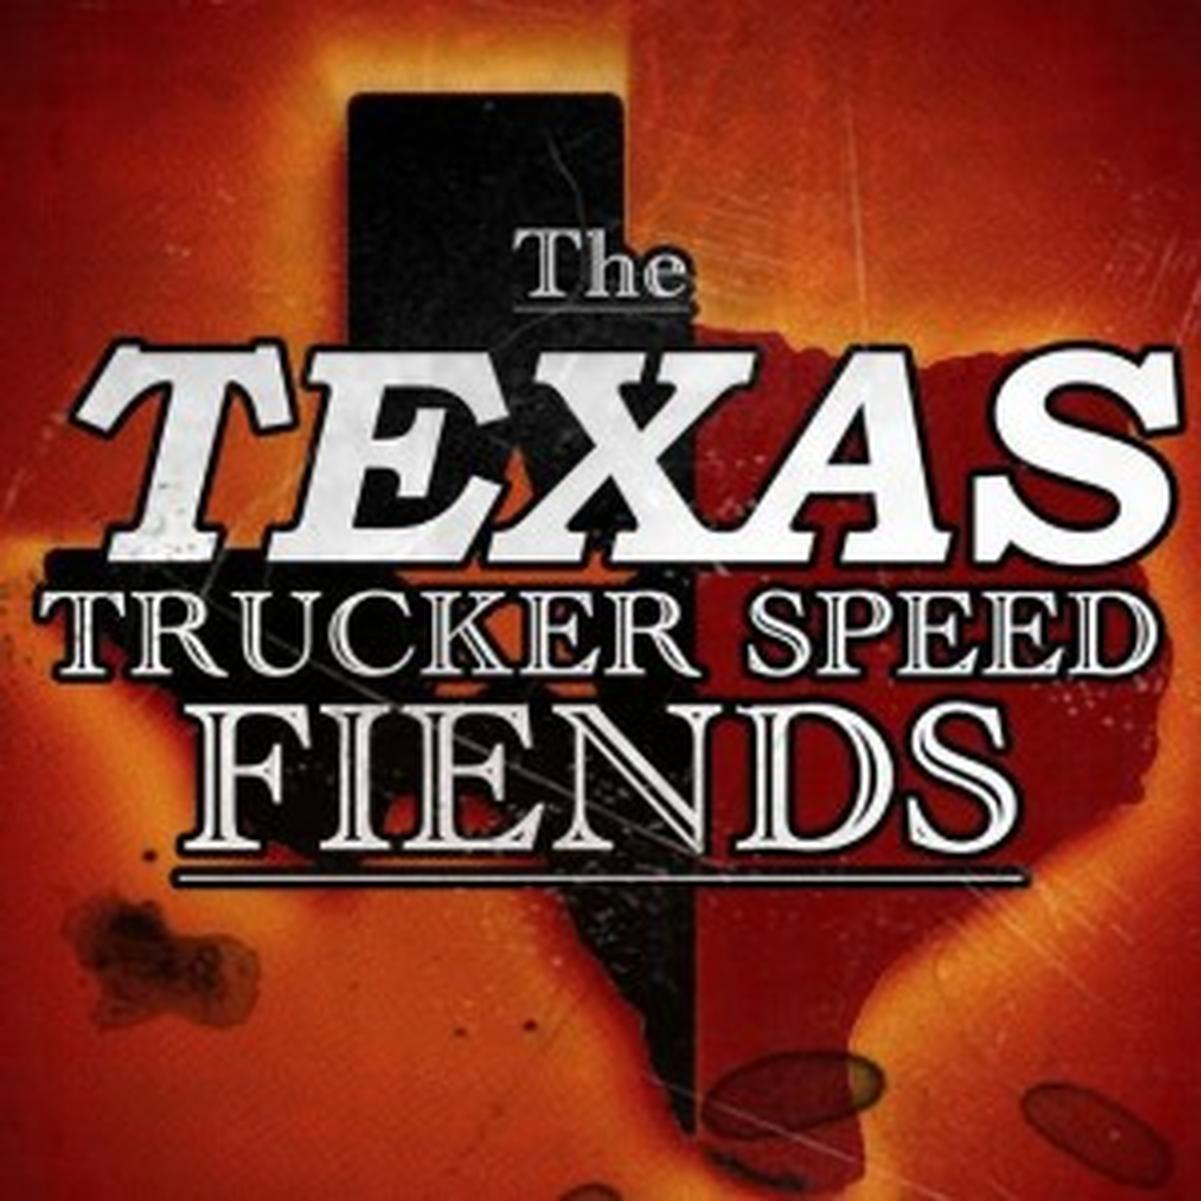 Texas Trucker Speed Fiends